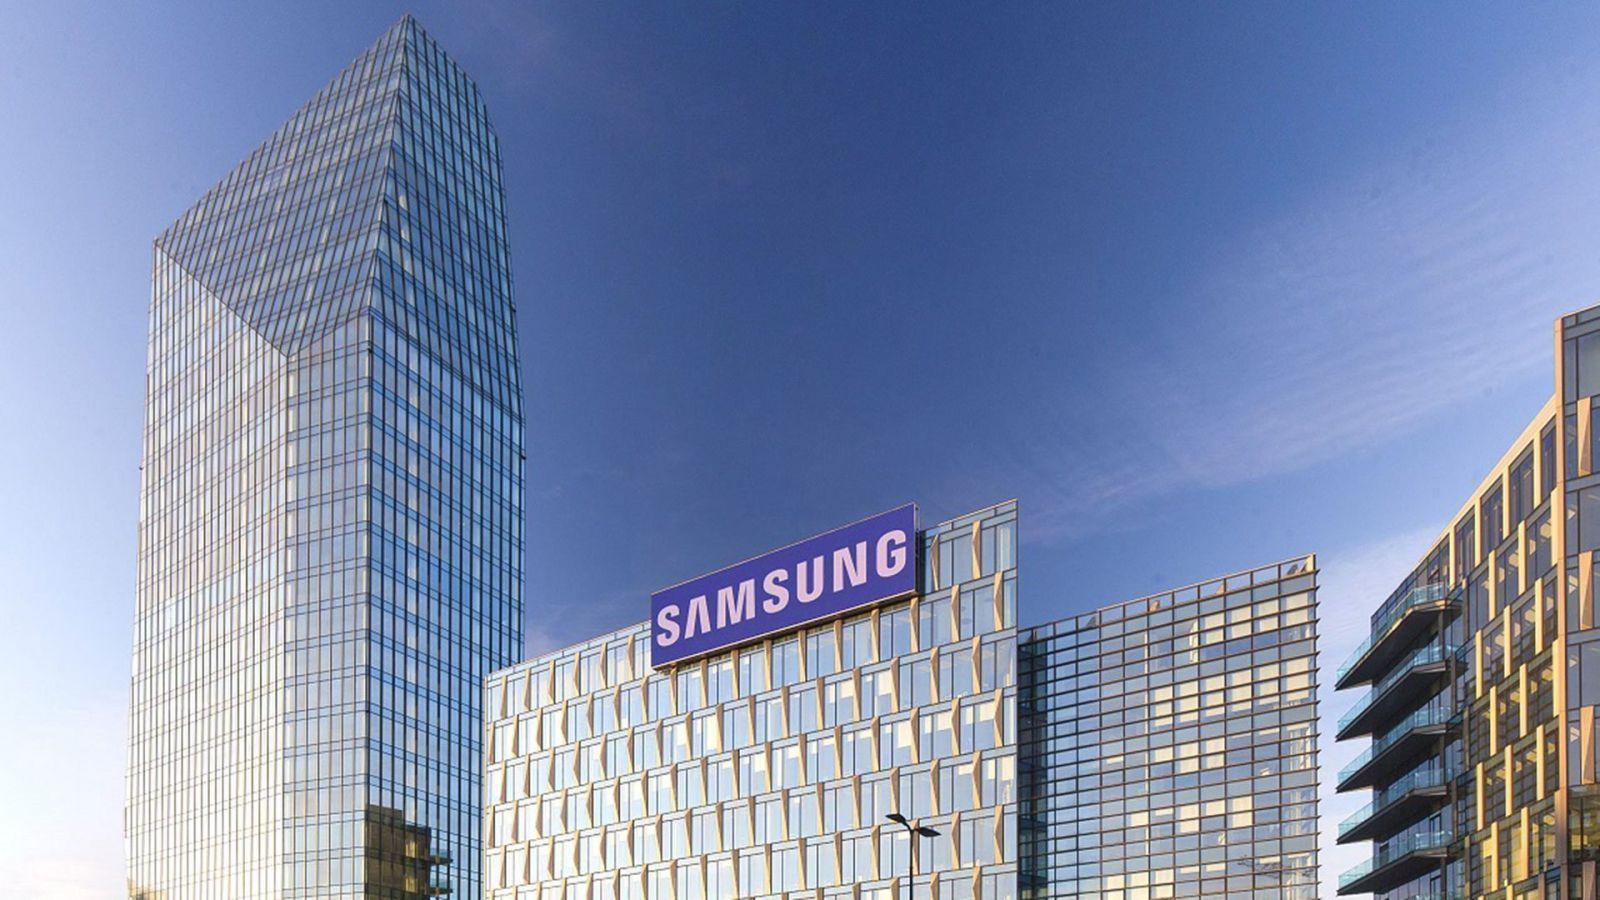 Samsung занимает более 90% рынка QLED-телевизоров